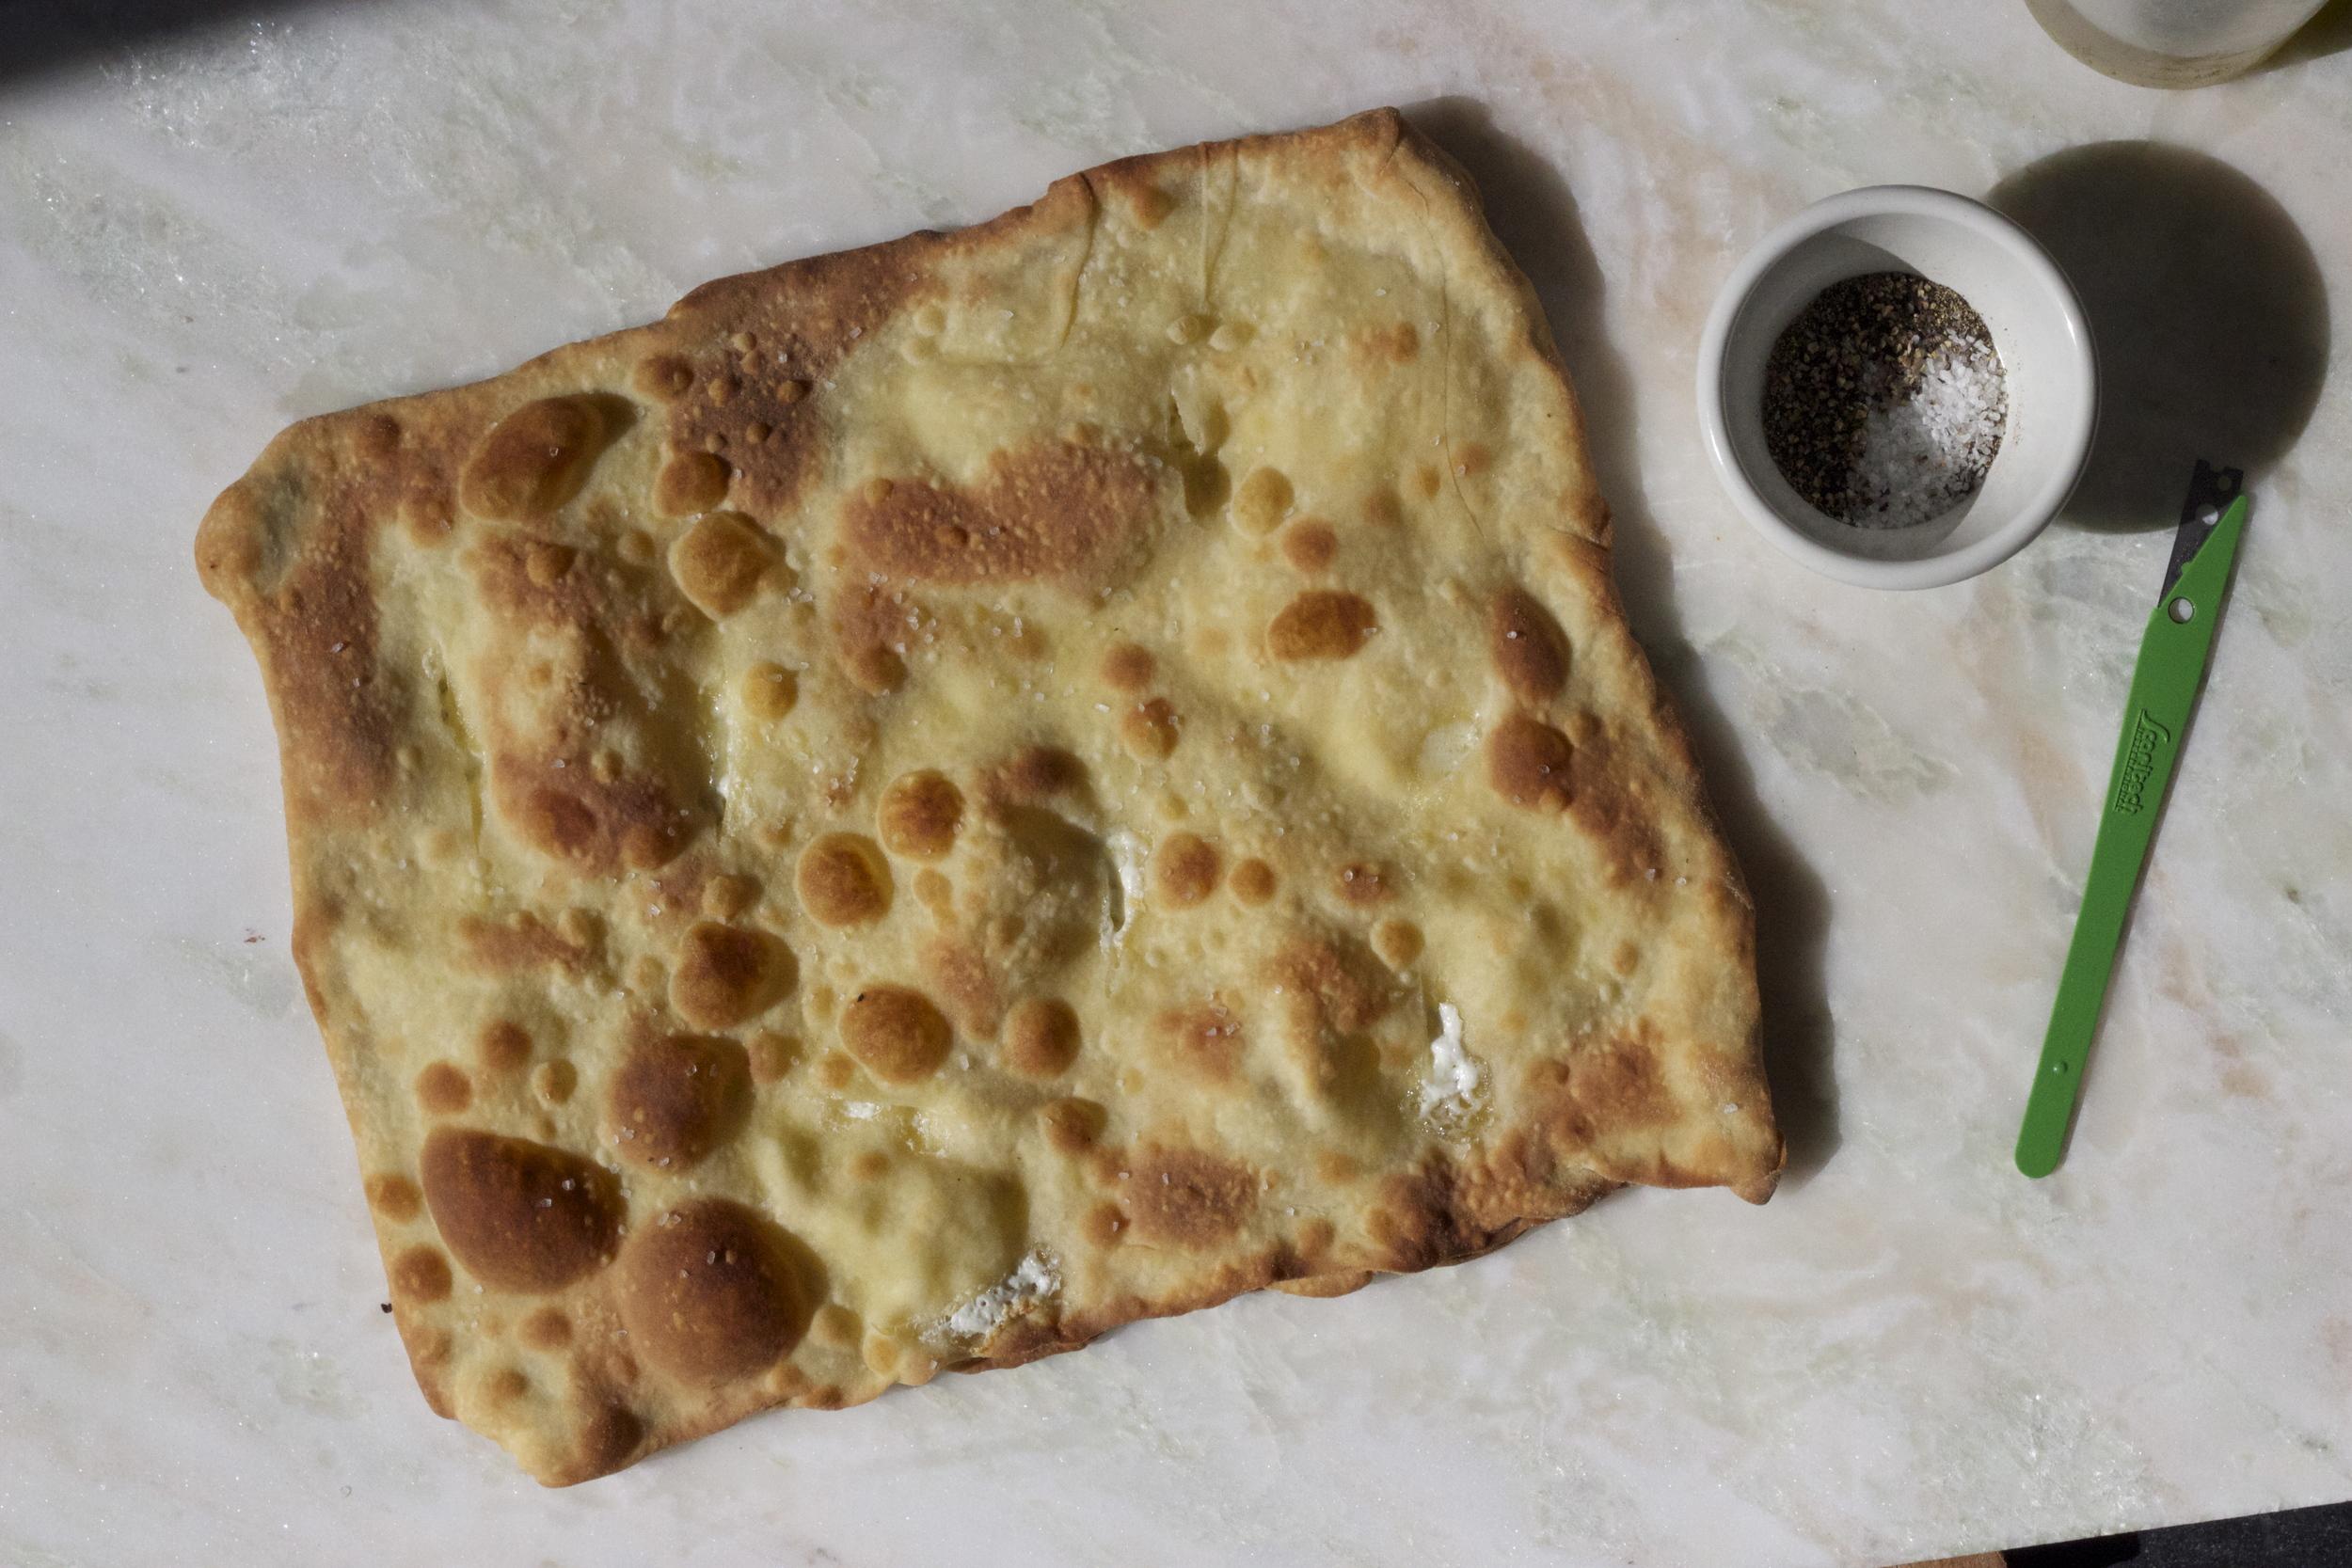 baked focaccia di recco